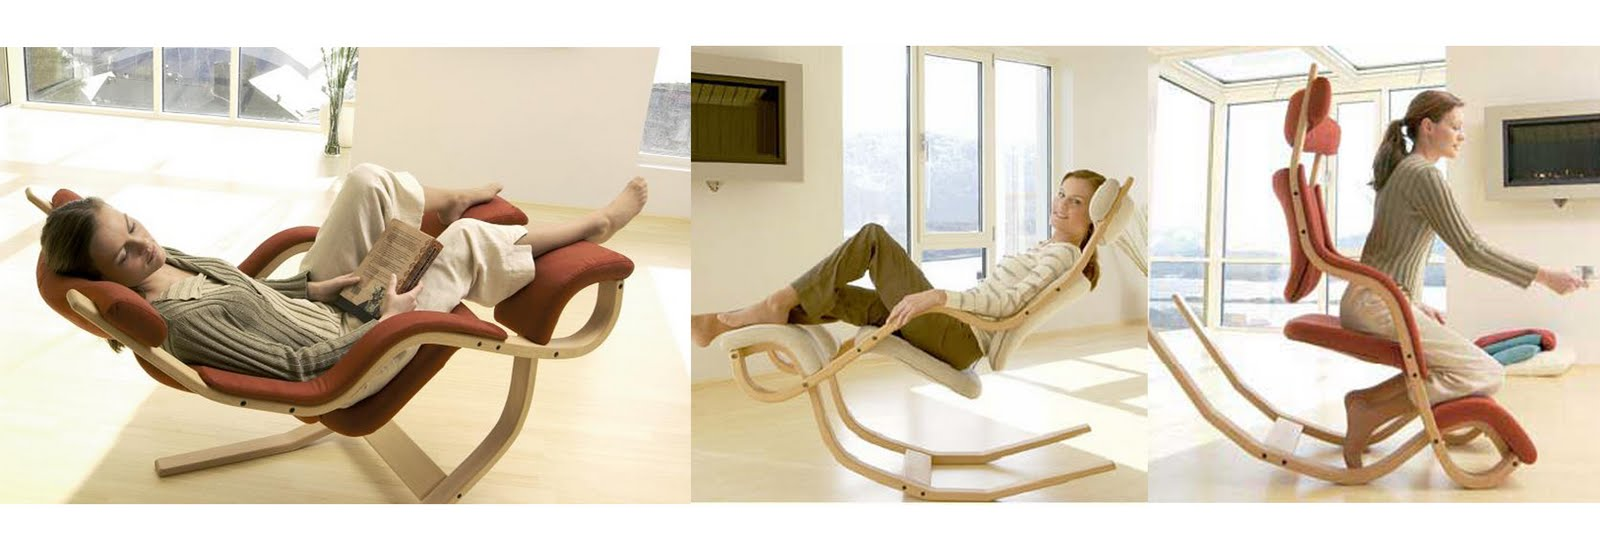 197.134 Digital Design and Visualisation: October 2010 - Gravity Balans Chair